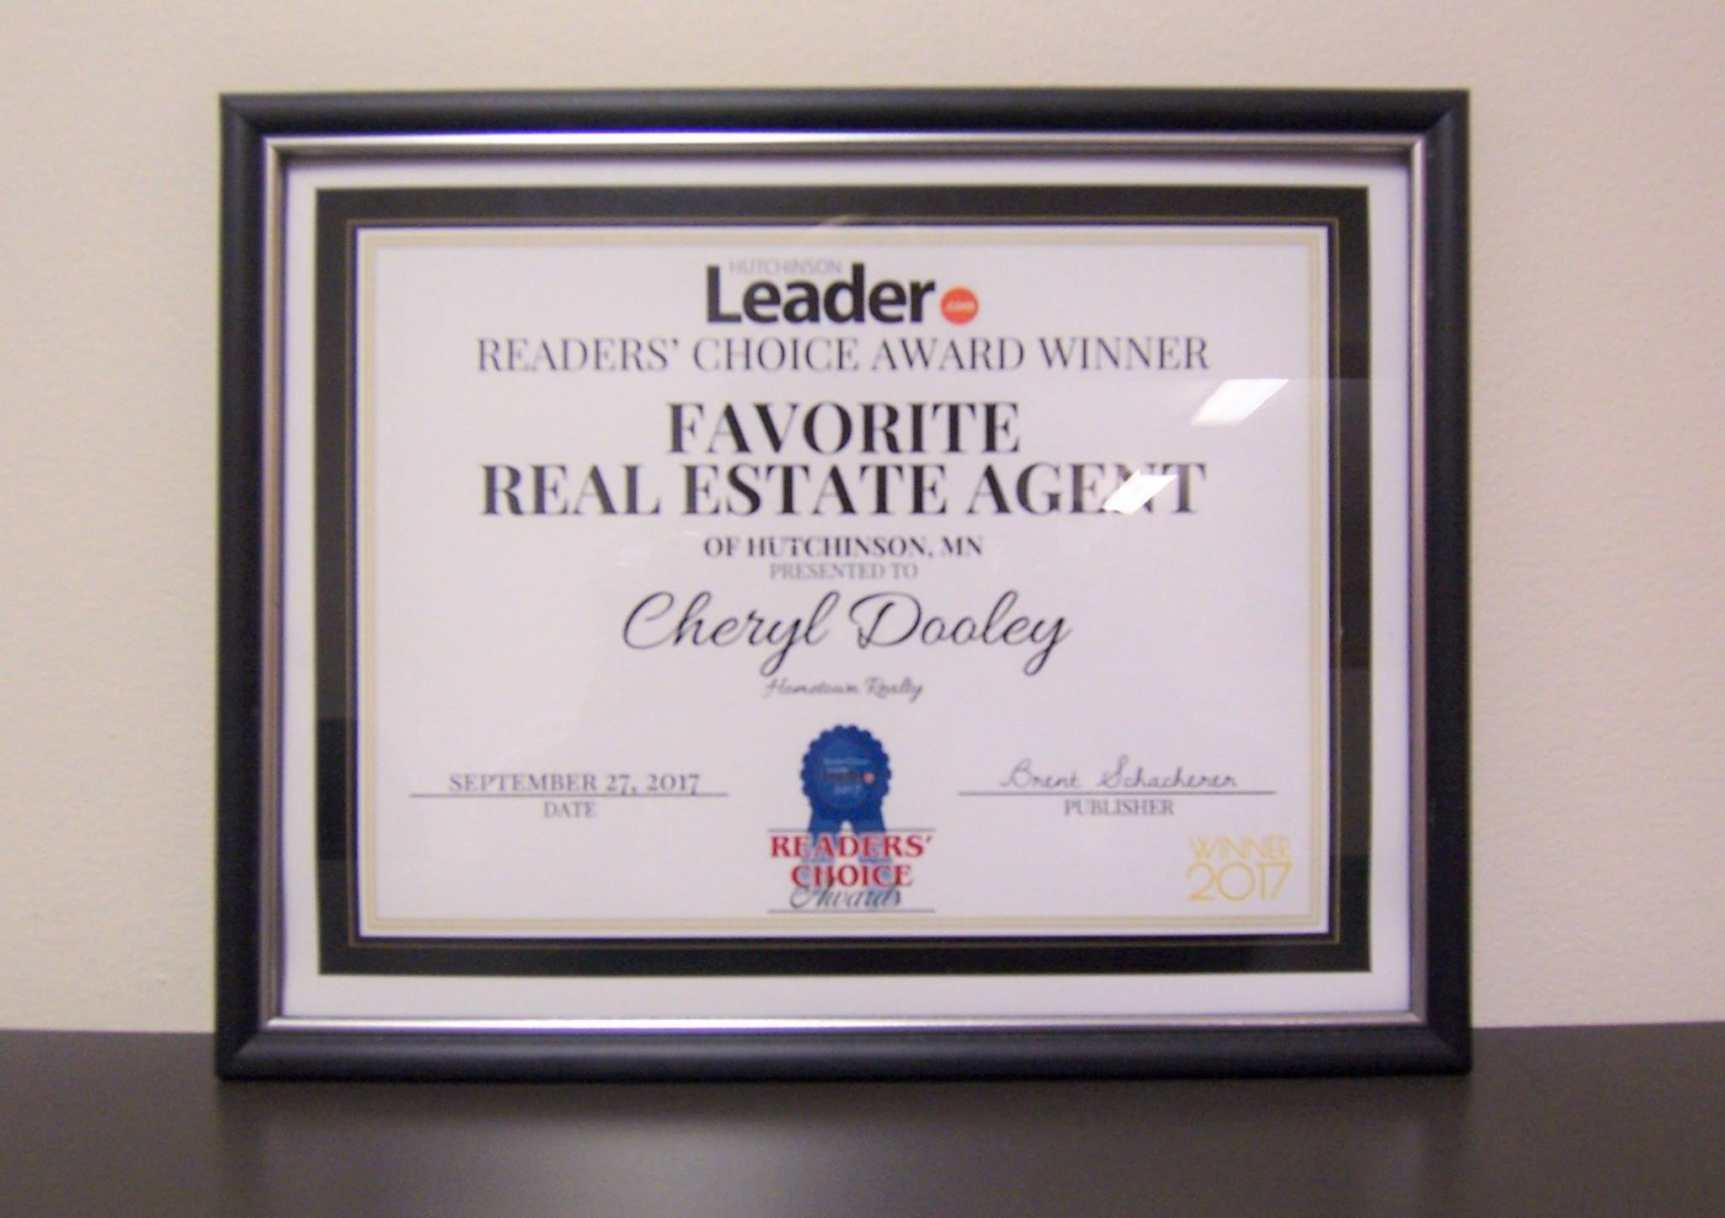 Cheryl Dooley Favorite Real Estate Agent Award